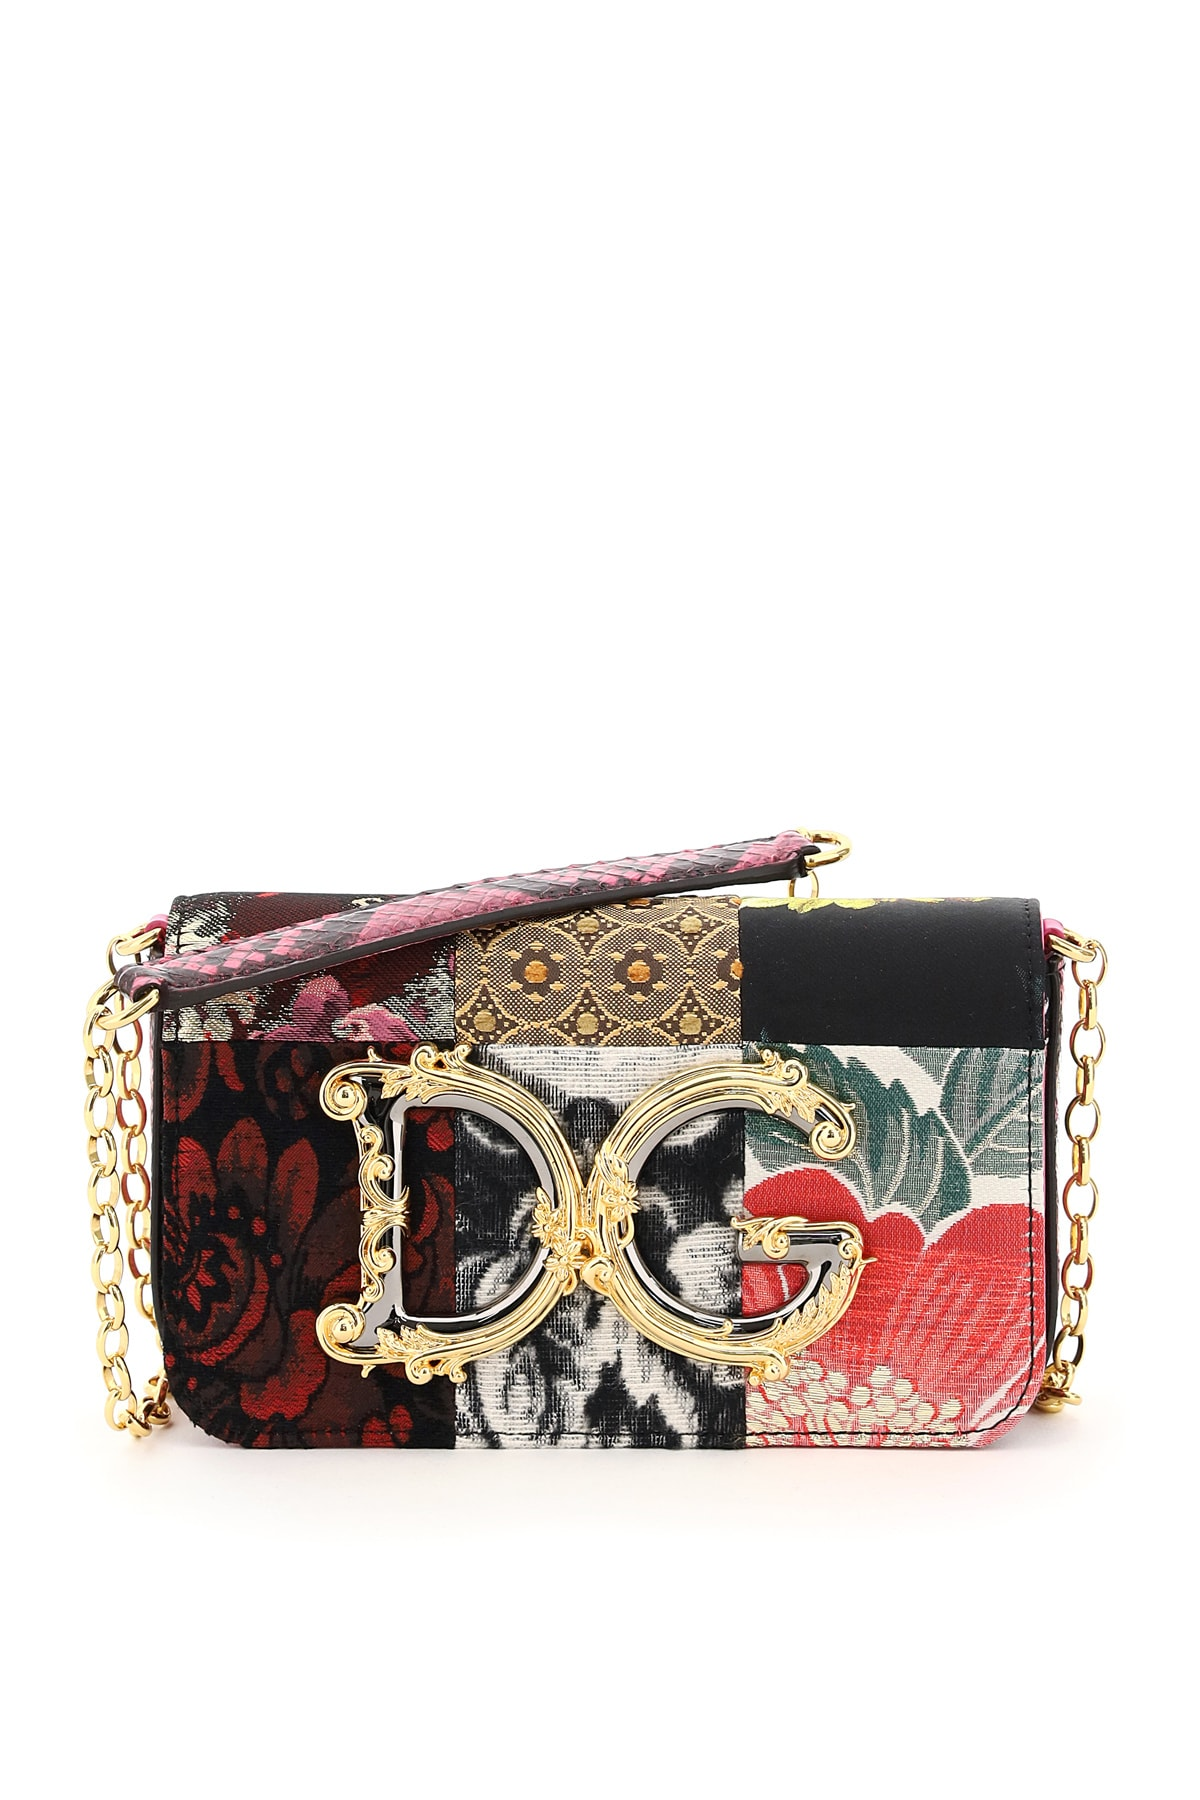 Dolce & Gabbana PATCHWORK DG GIRL BAROCCO MINI BAG